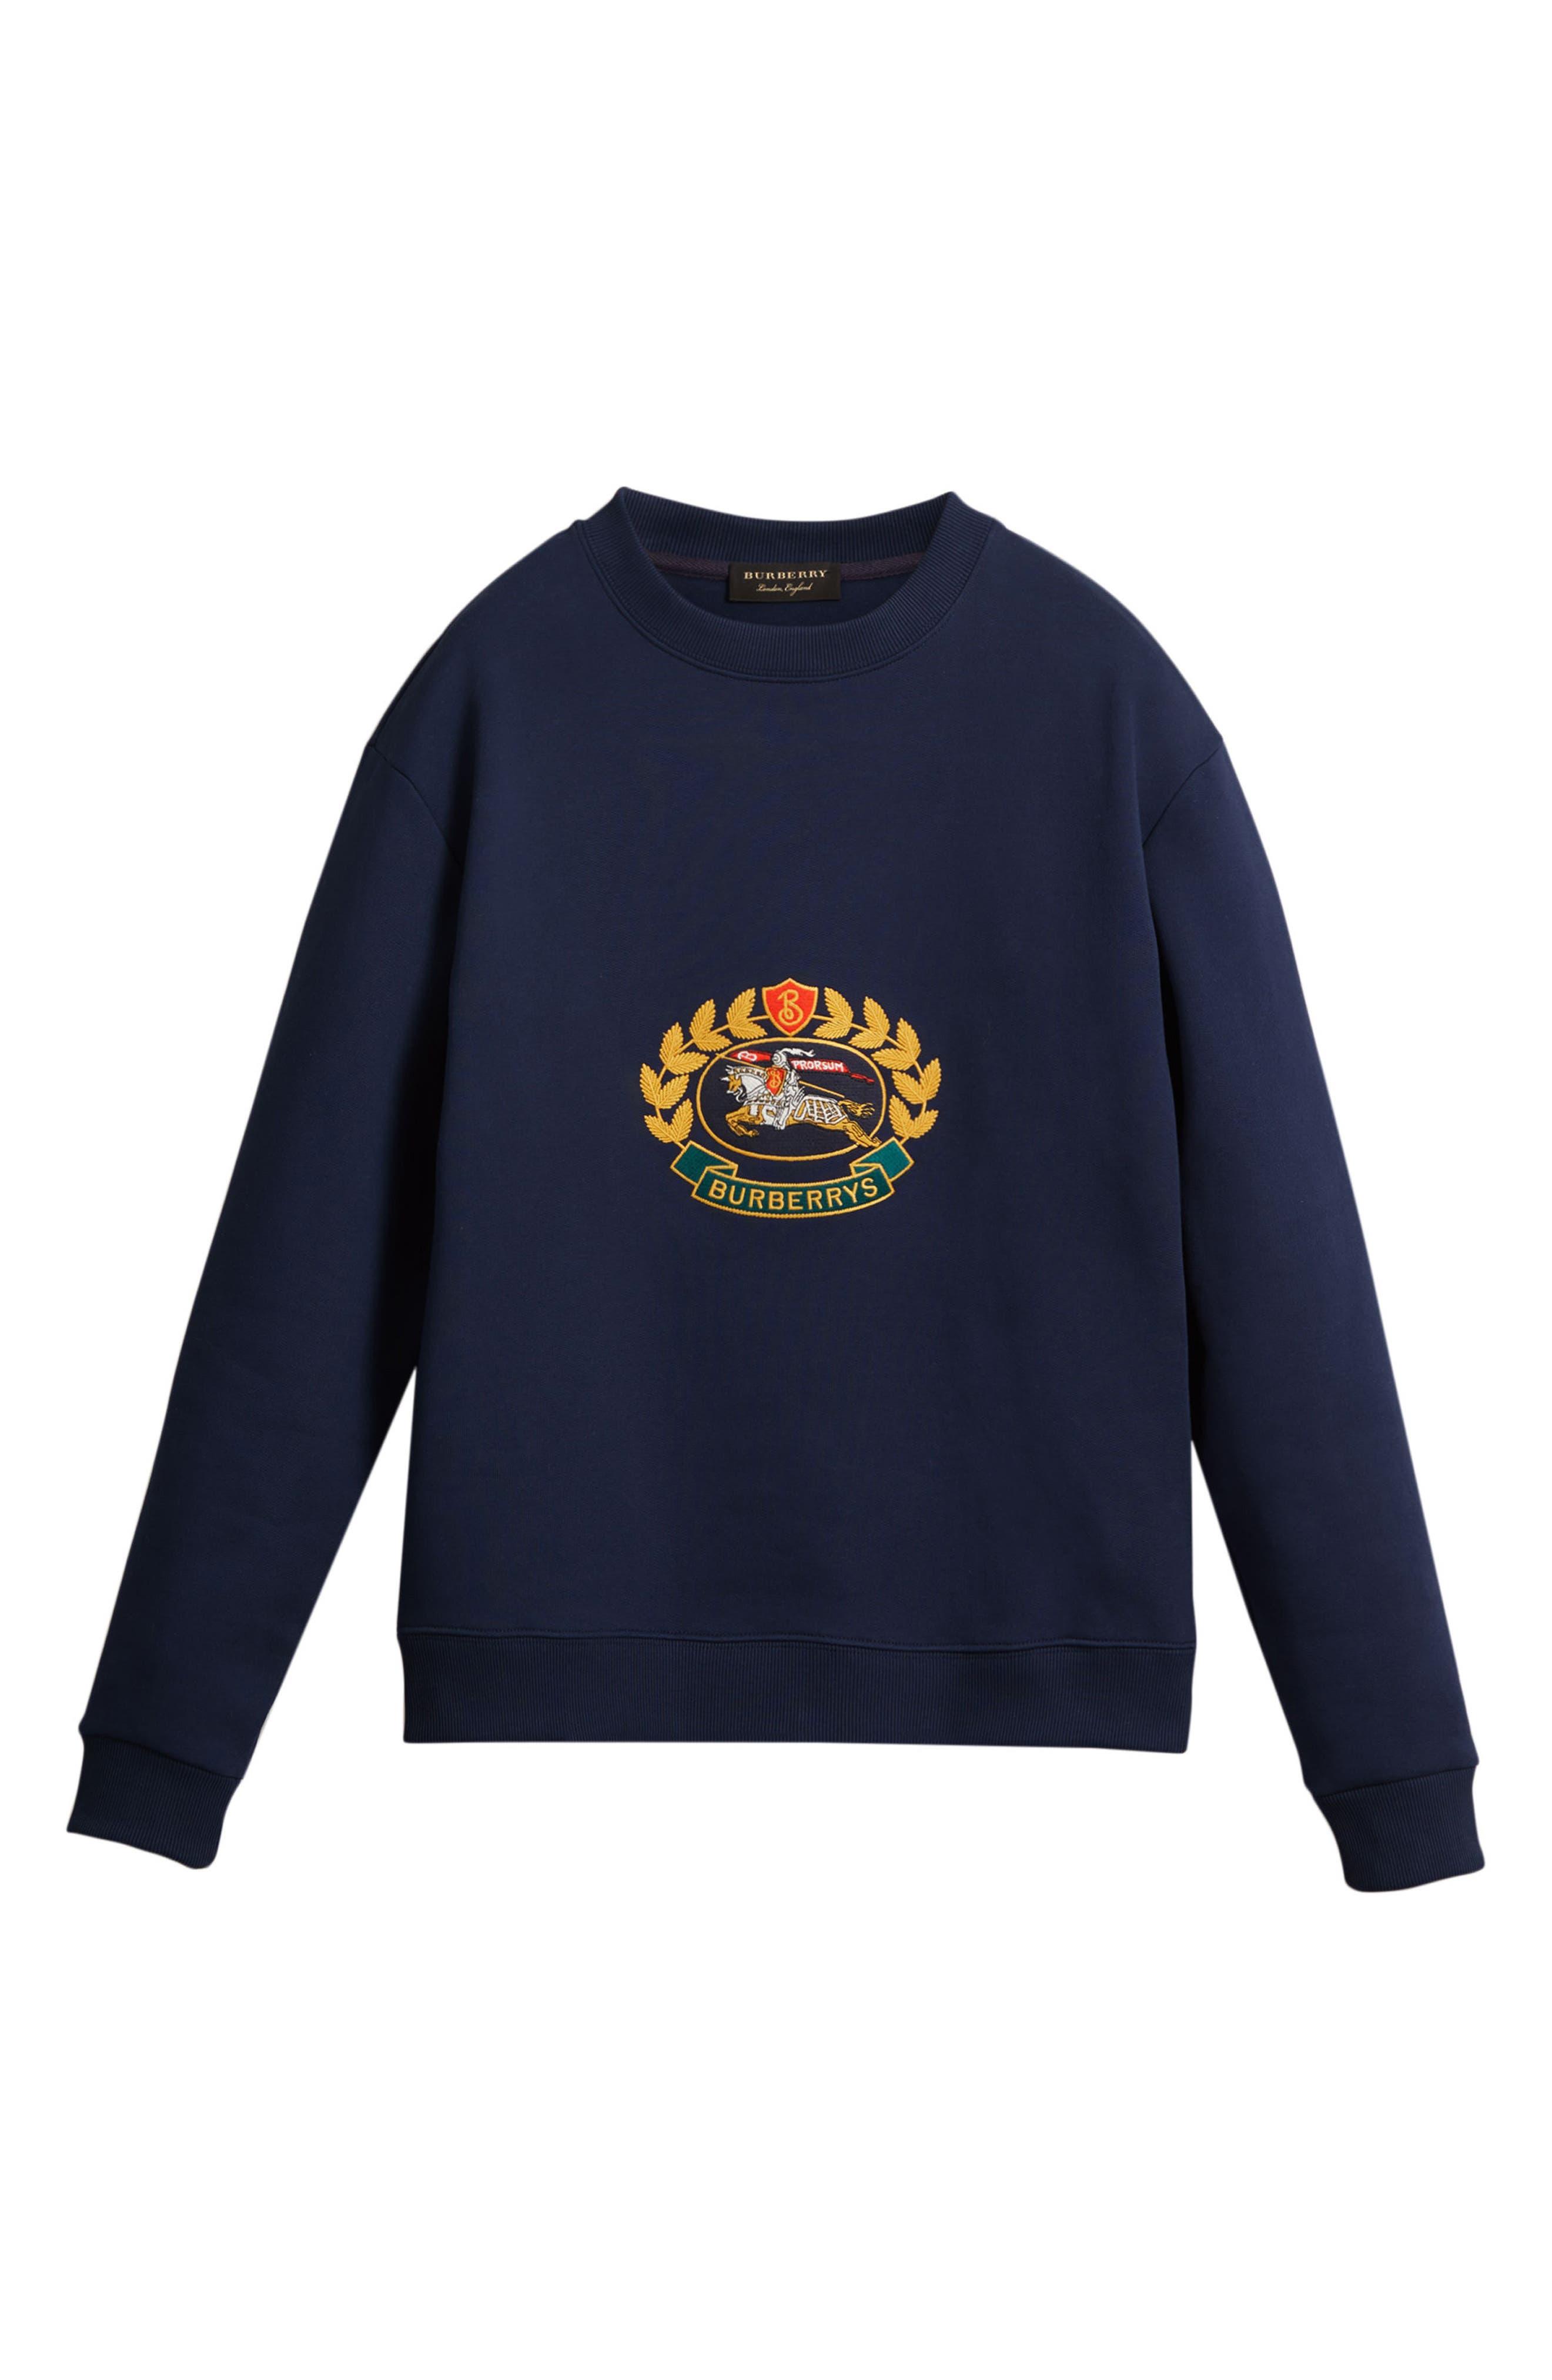 Vintage Crest Sweatshirt,                             Alternate thumbnail 4, color,                             Midnight Blue